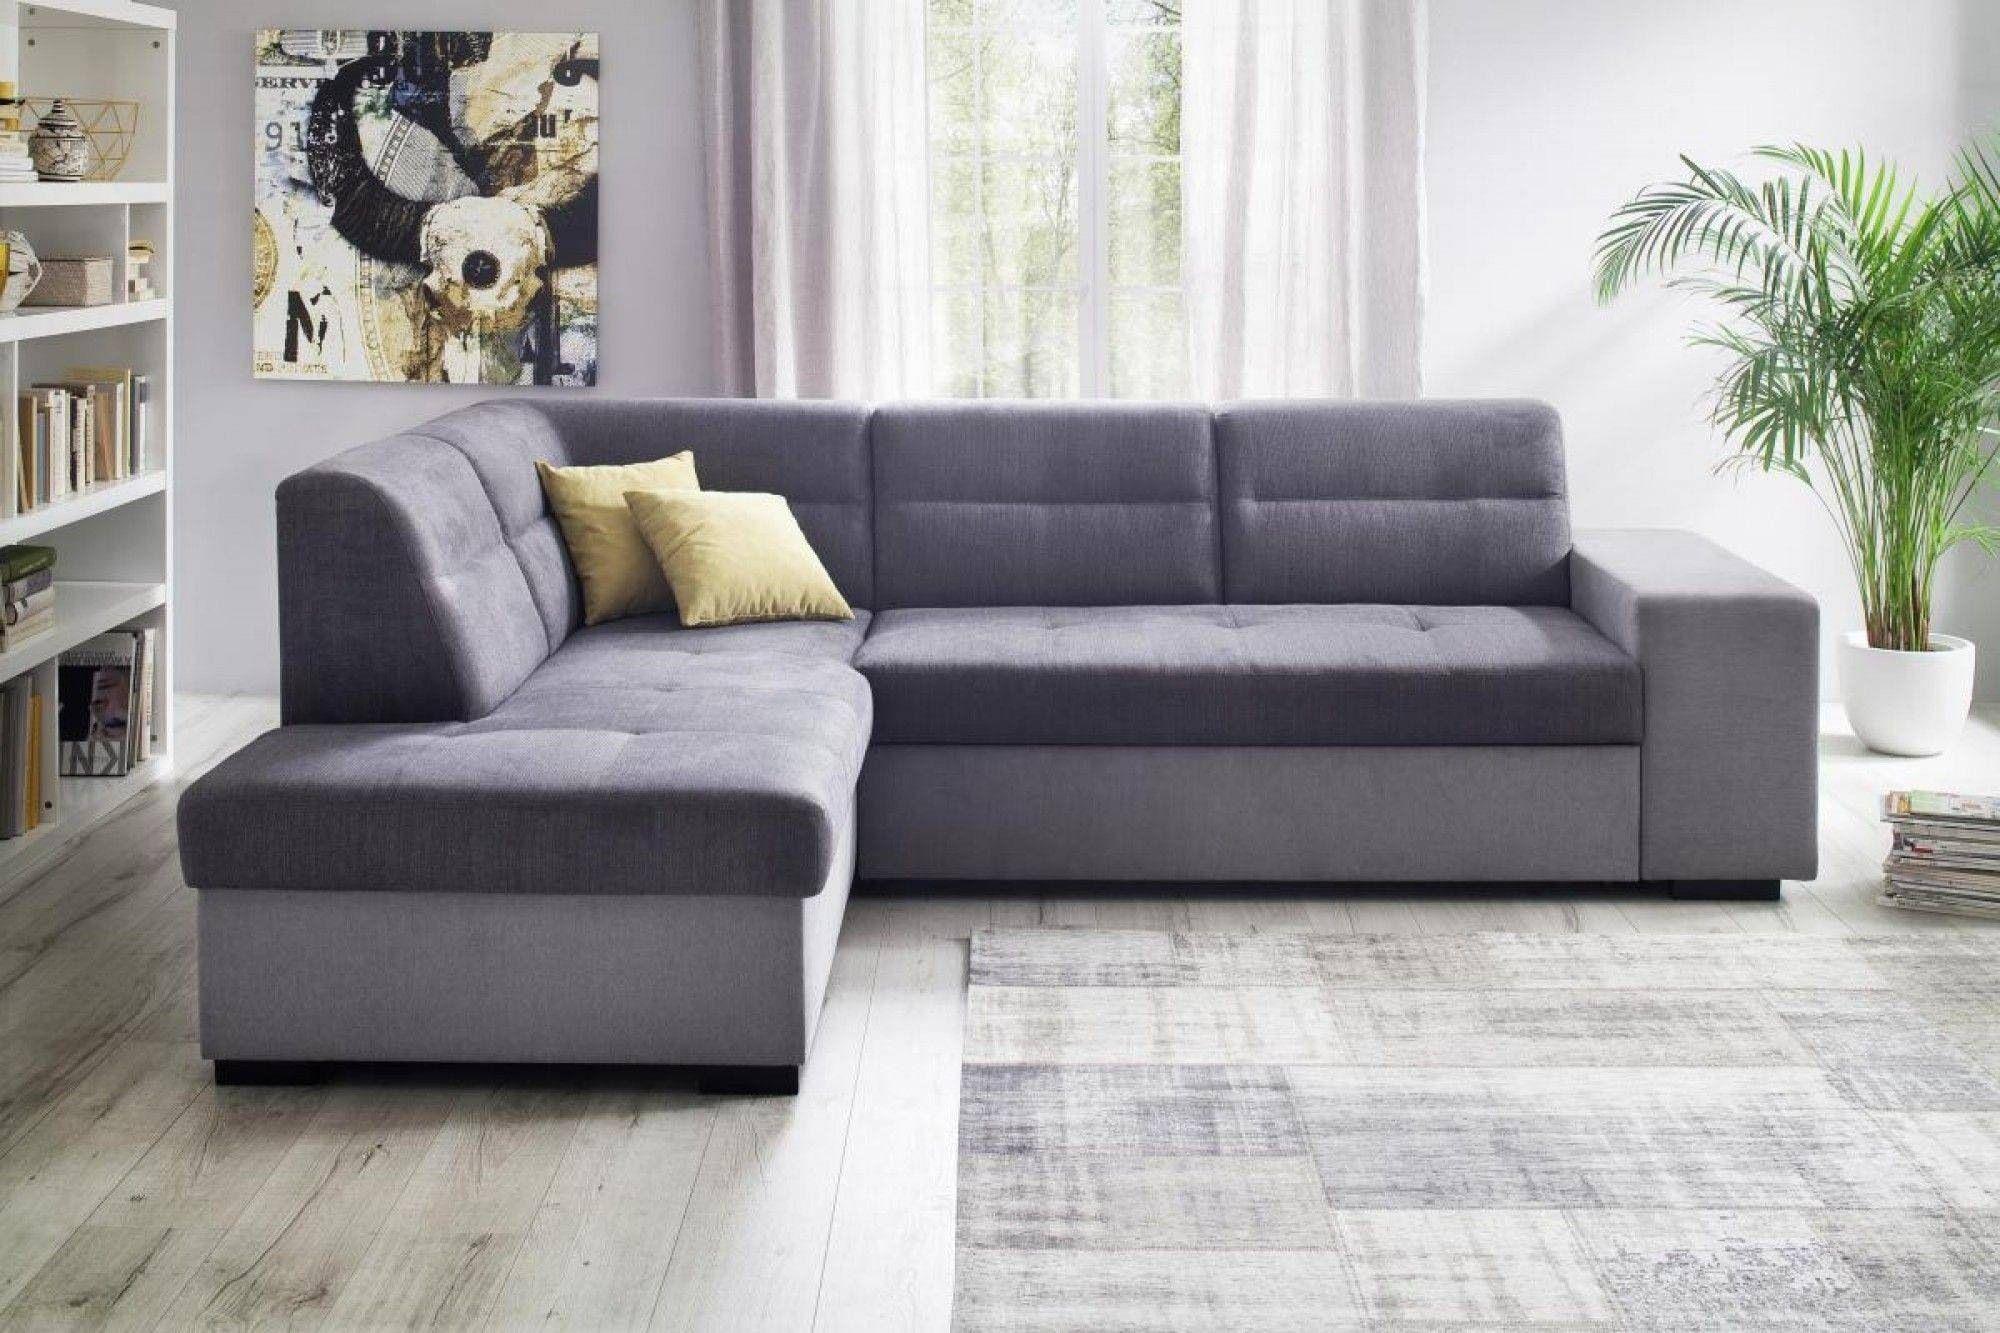 Poco Schlafsofa Einzigartig Sofas Poco Neu Gunstig Sofa Kaufen Sofa Best Sofa Gunstig Poco Full Bilder